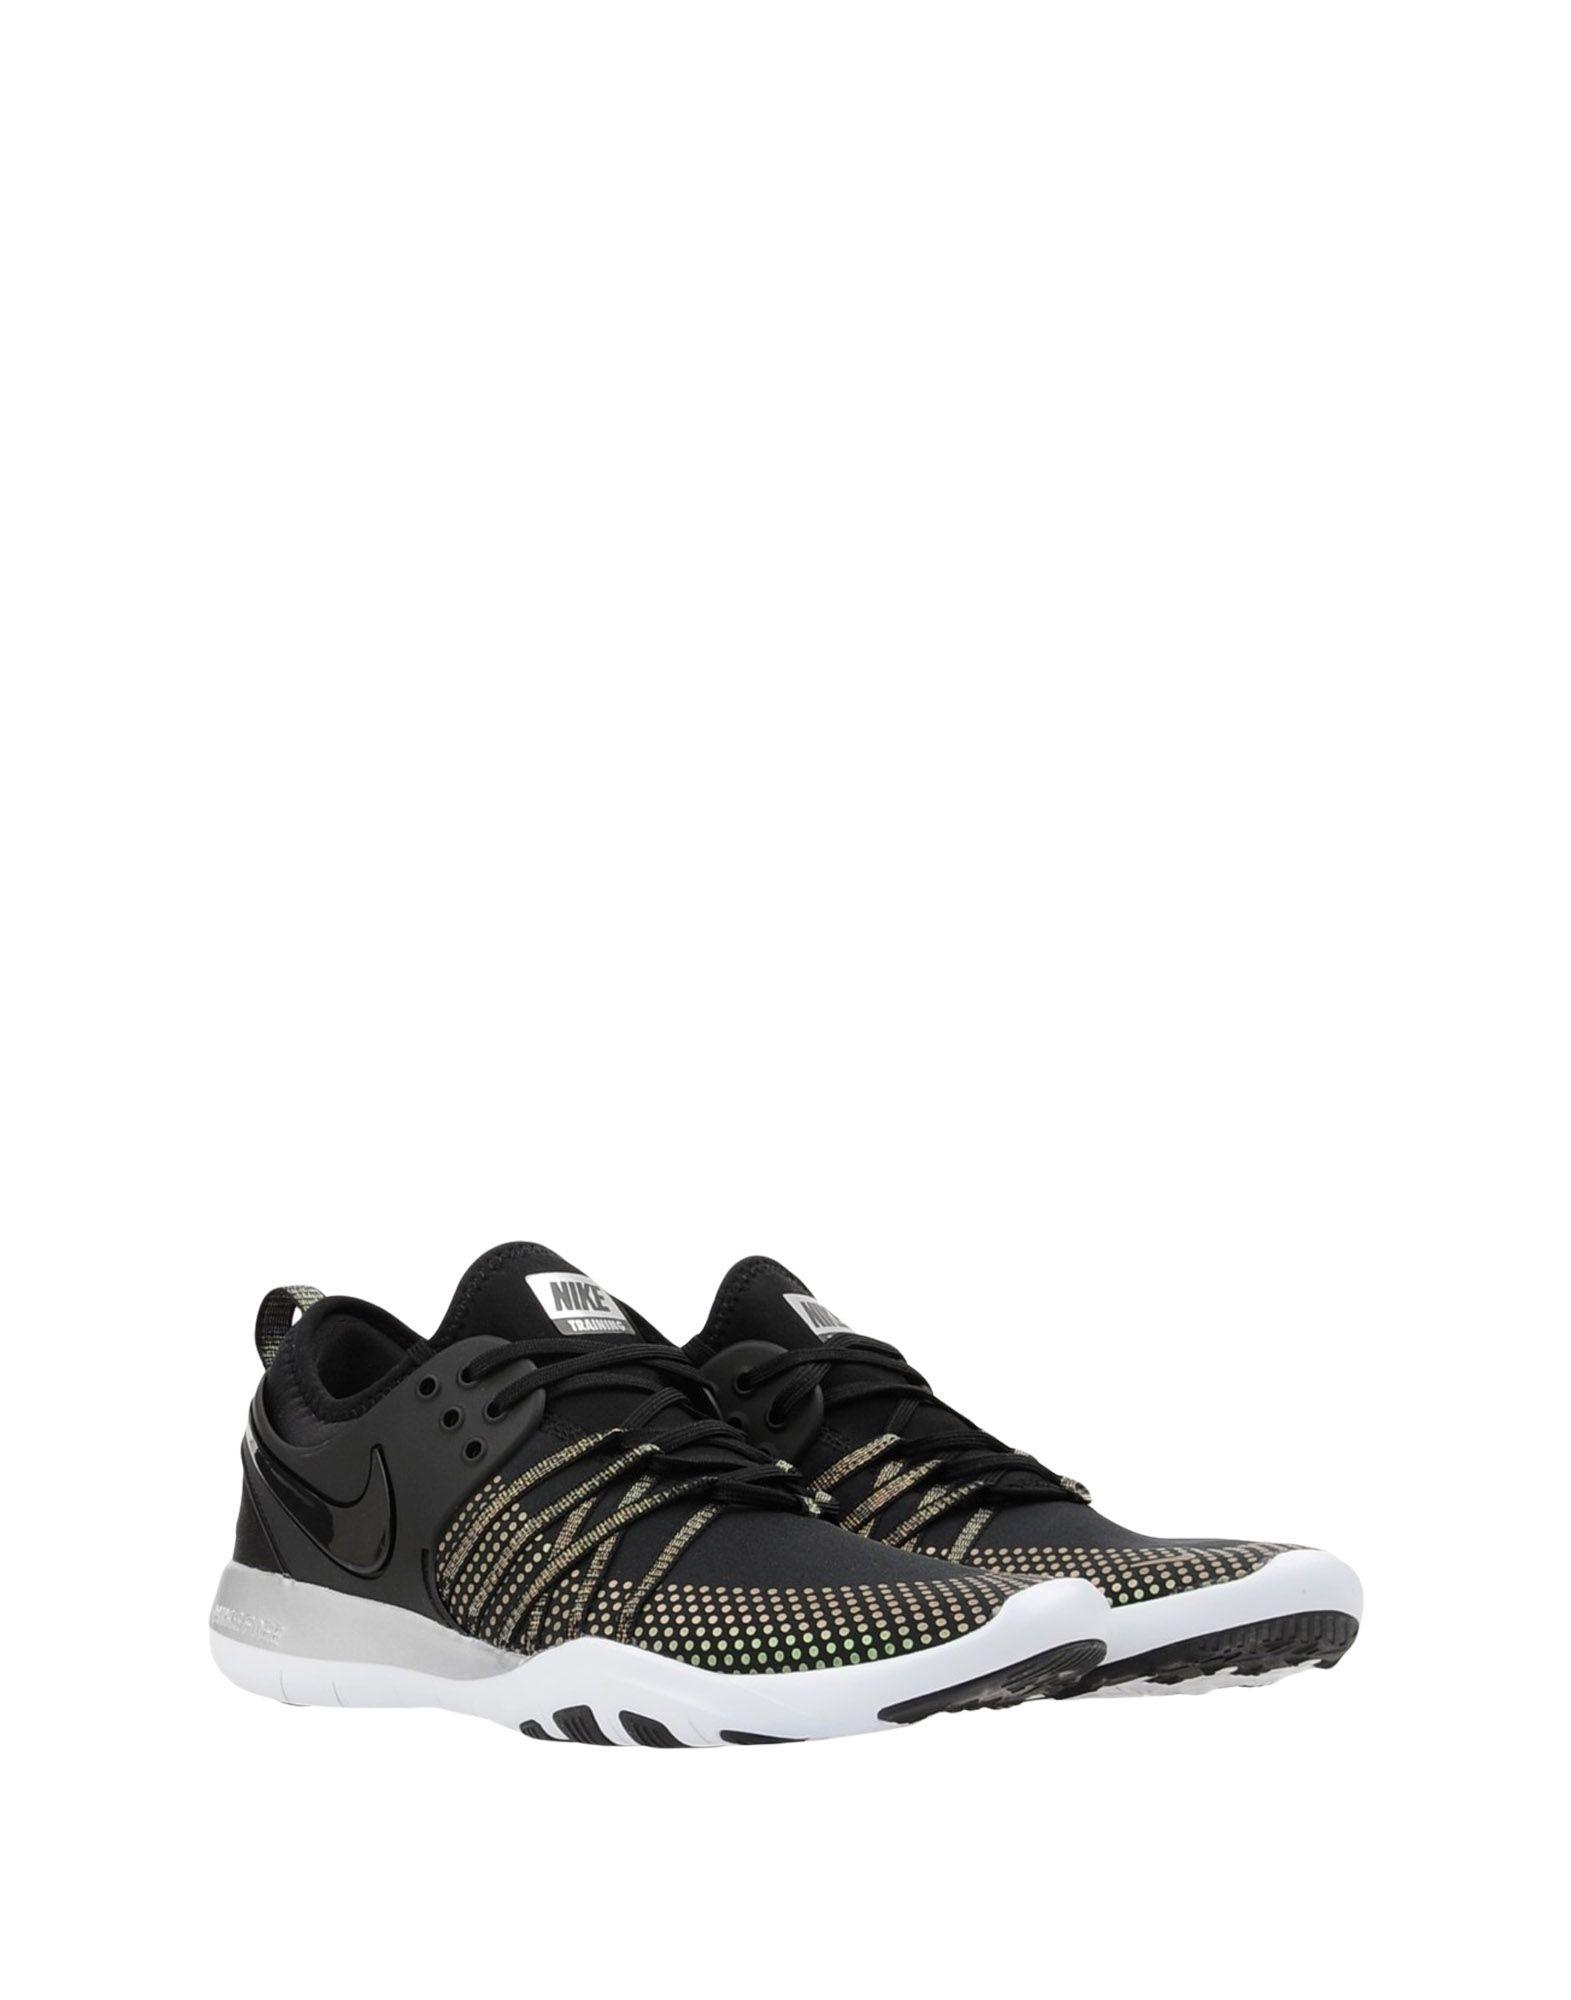 Nike   Free Free Free Tr 7 Metallic  11383031PA Gute Qualität beliebte Schuhe 57d0c8